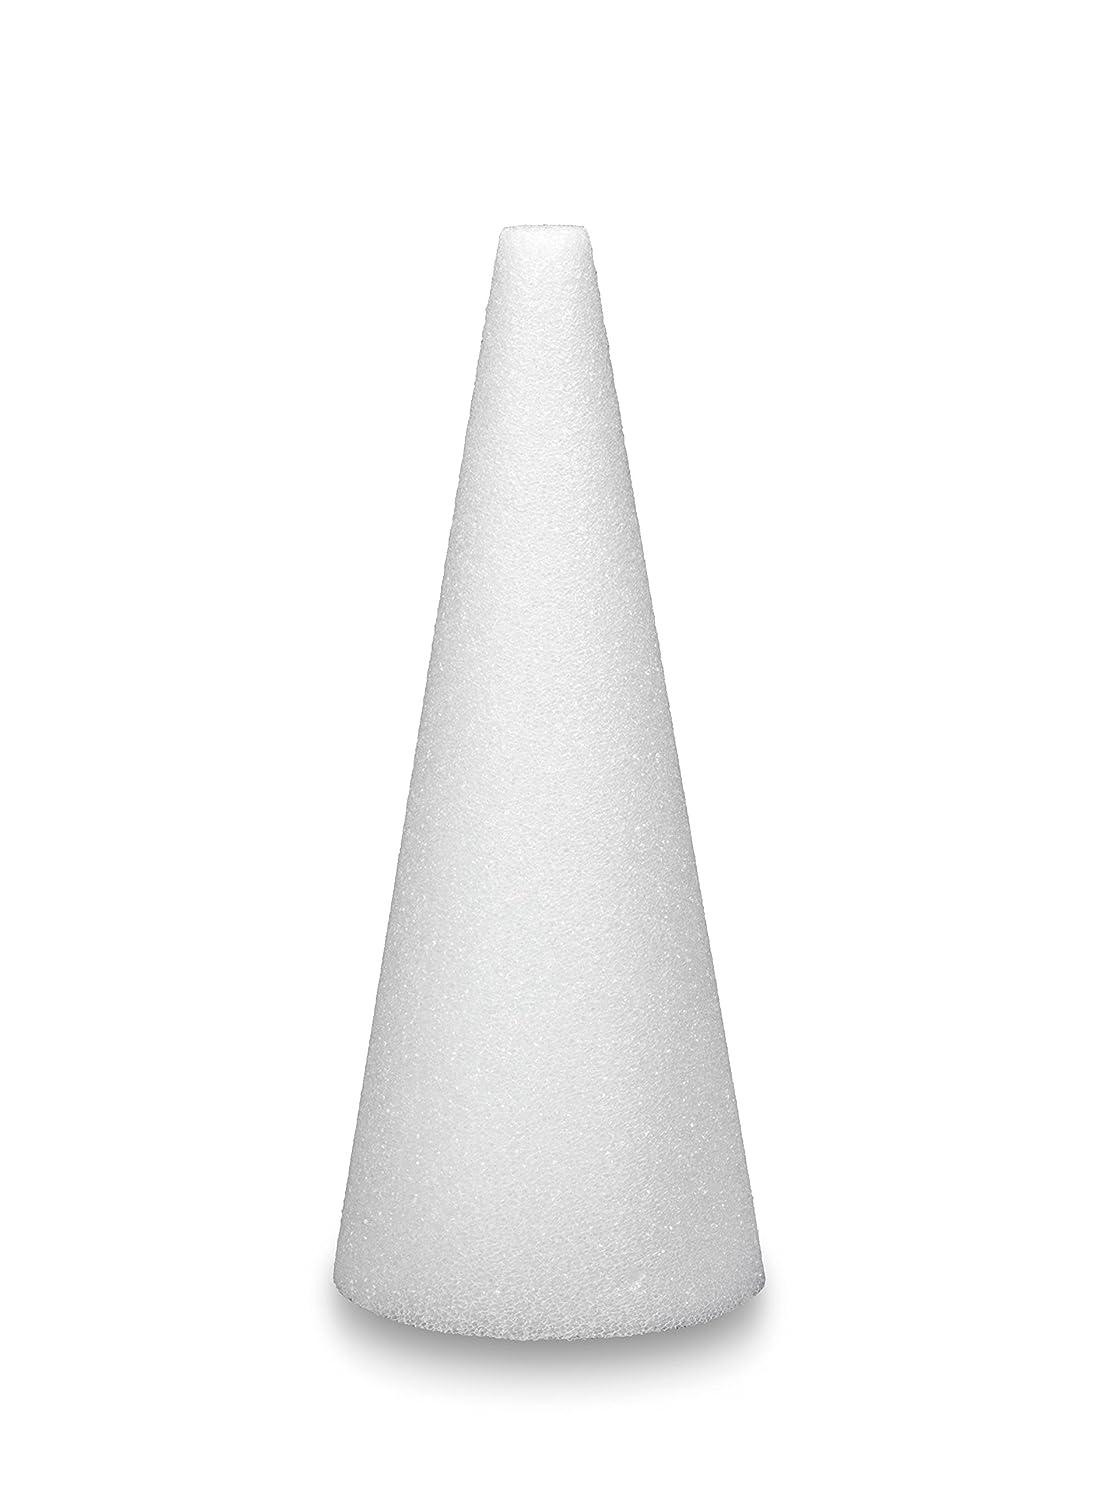 FloraCraft Styrofoam Cone 3.8 Inch x 11.8 Inch White